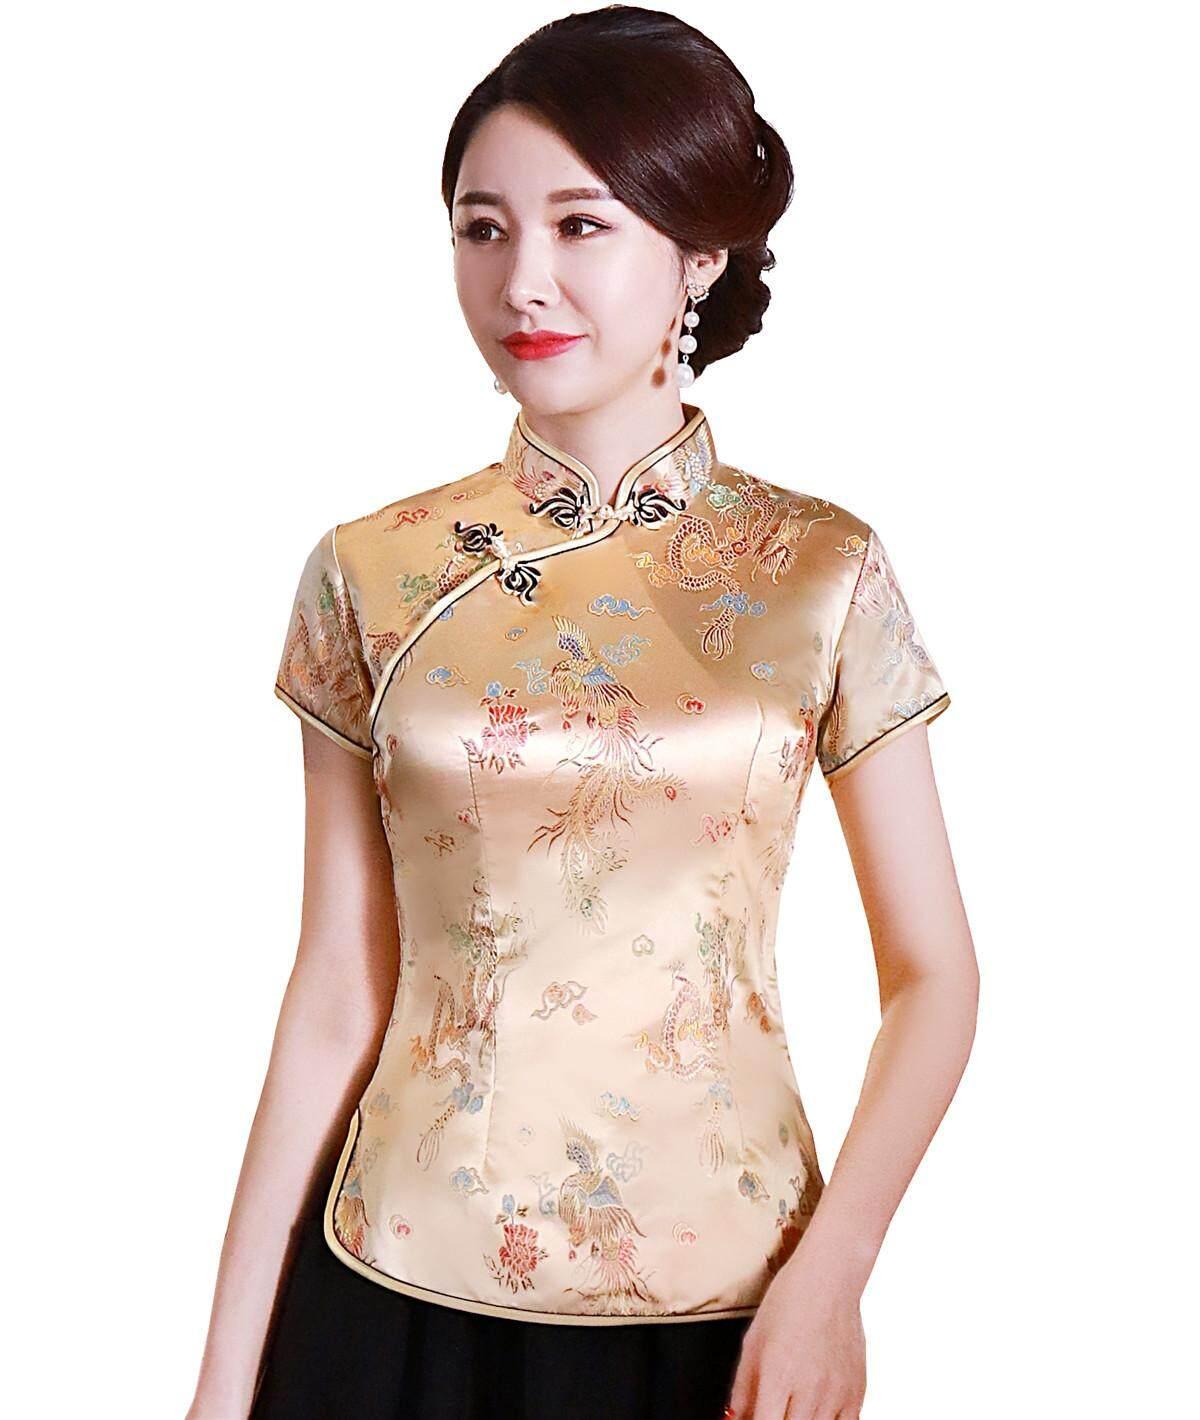 fea27549b Shanghai Story Dragon Embroidery Chinese Cheongsam Shirt Short Sleeve China  Blouse for Women Gold